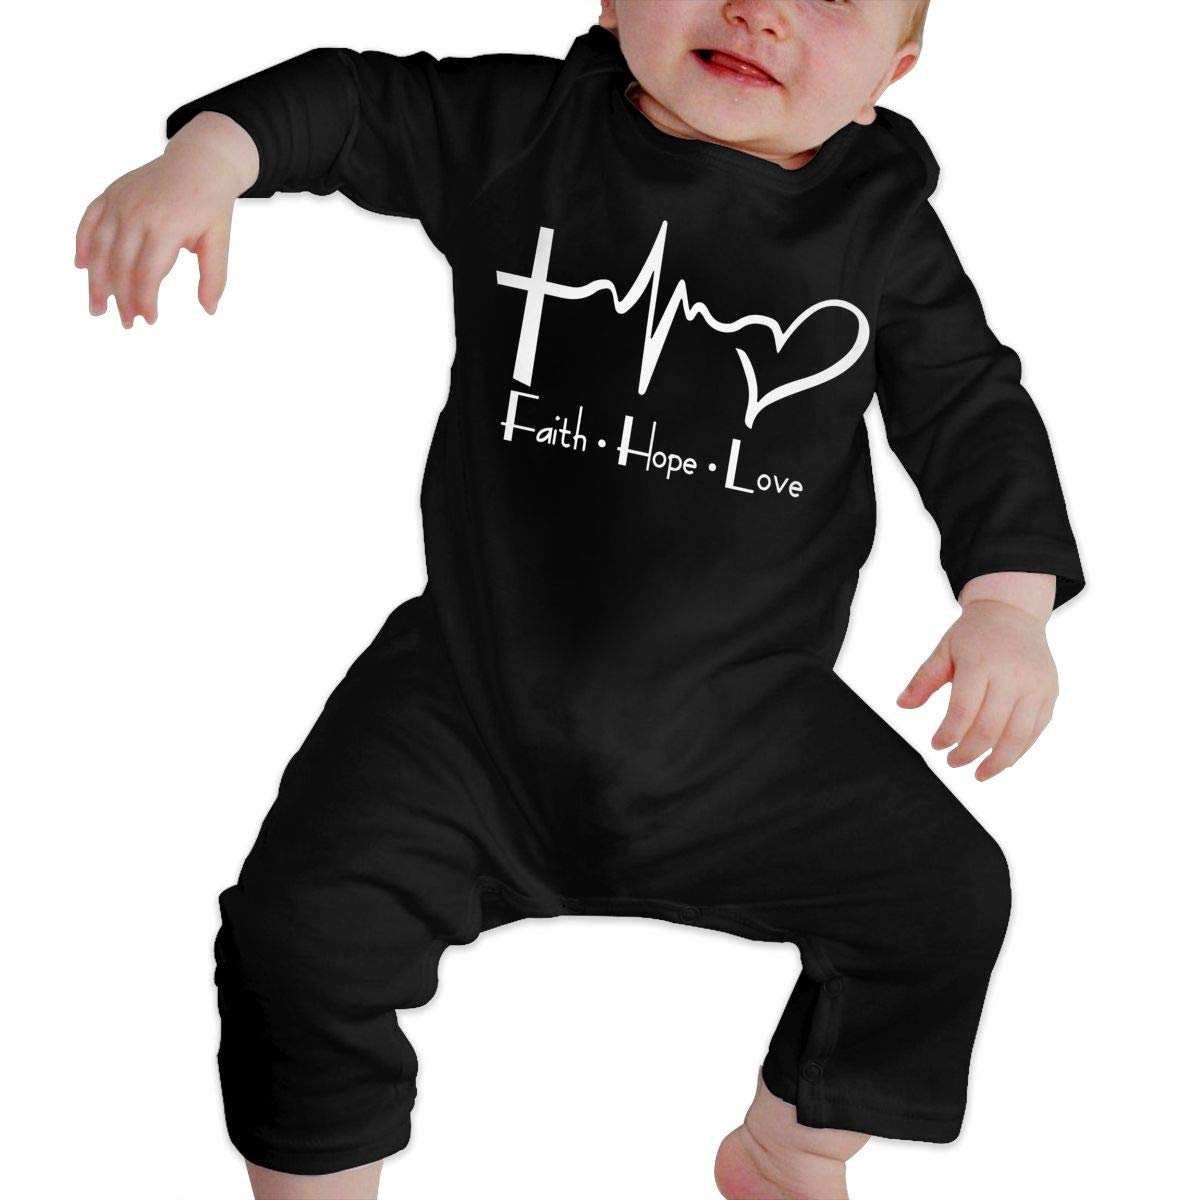 Newborn Baby Boys Girls Bodysuits Faith Hope Love Cotton Long Sleeve Romper Bodysuit